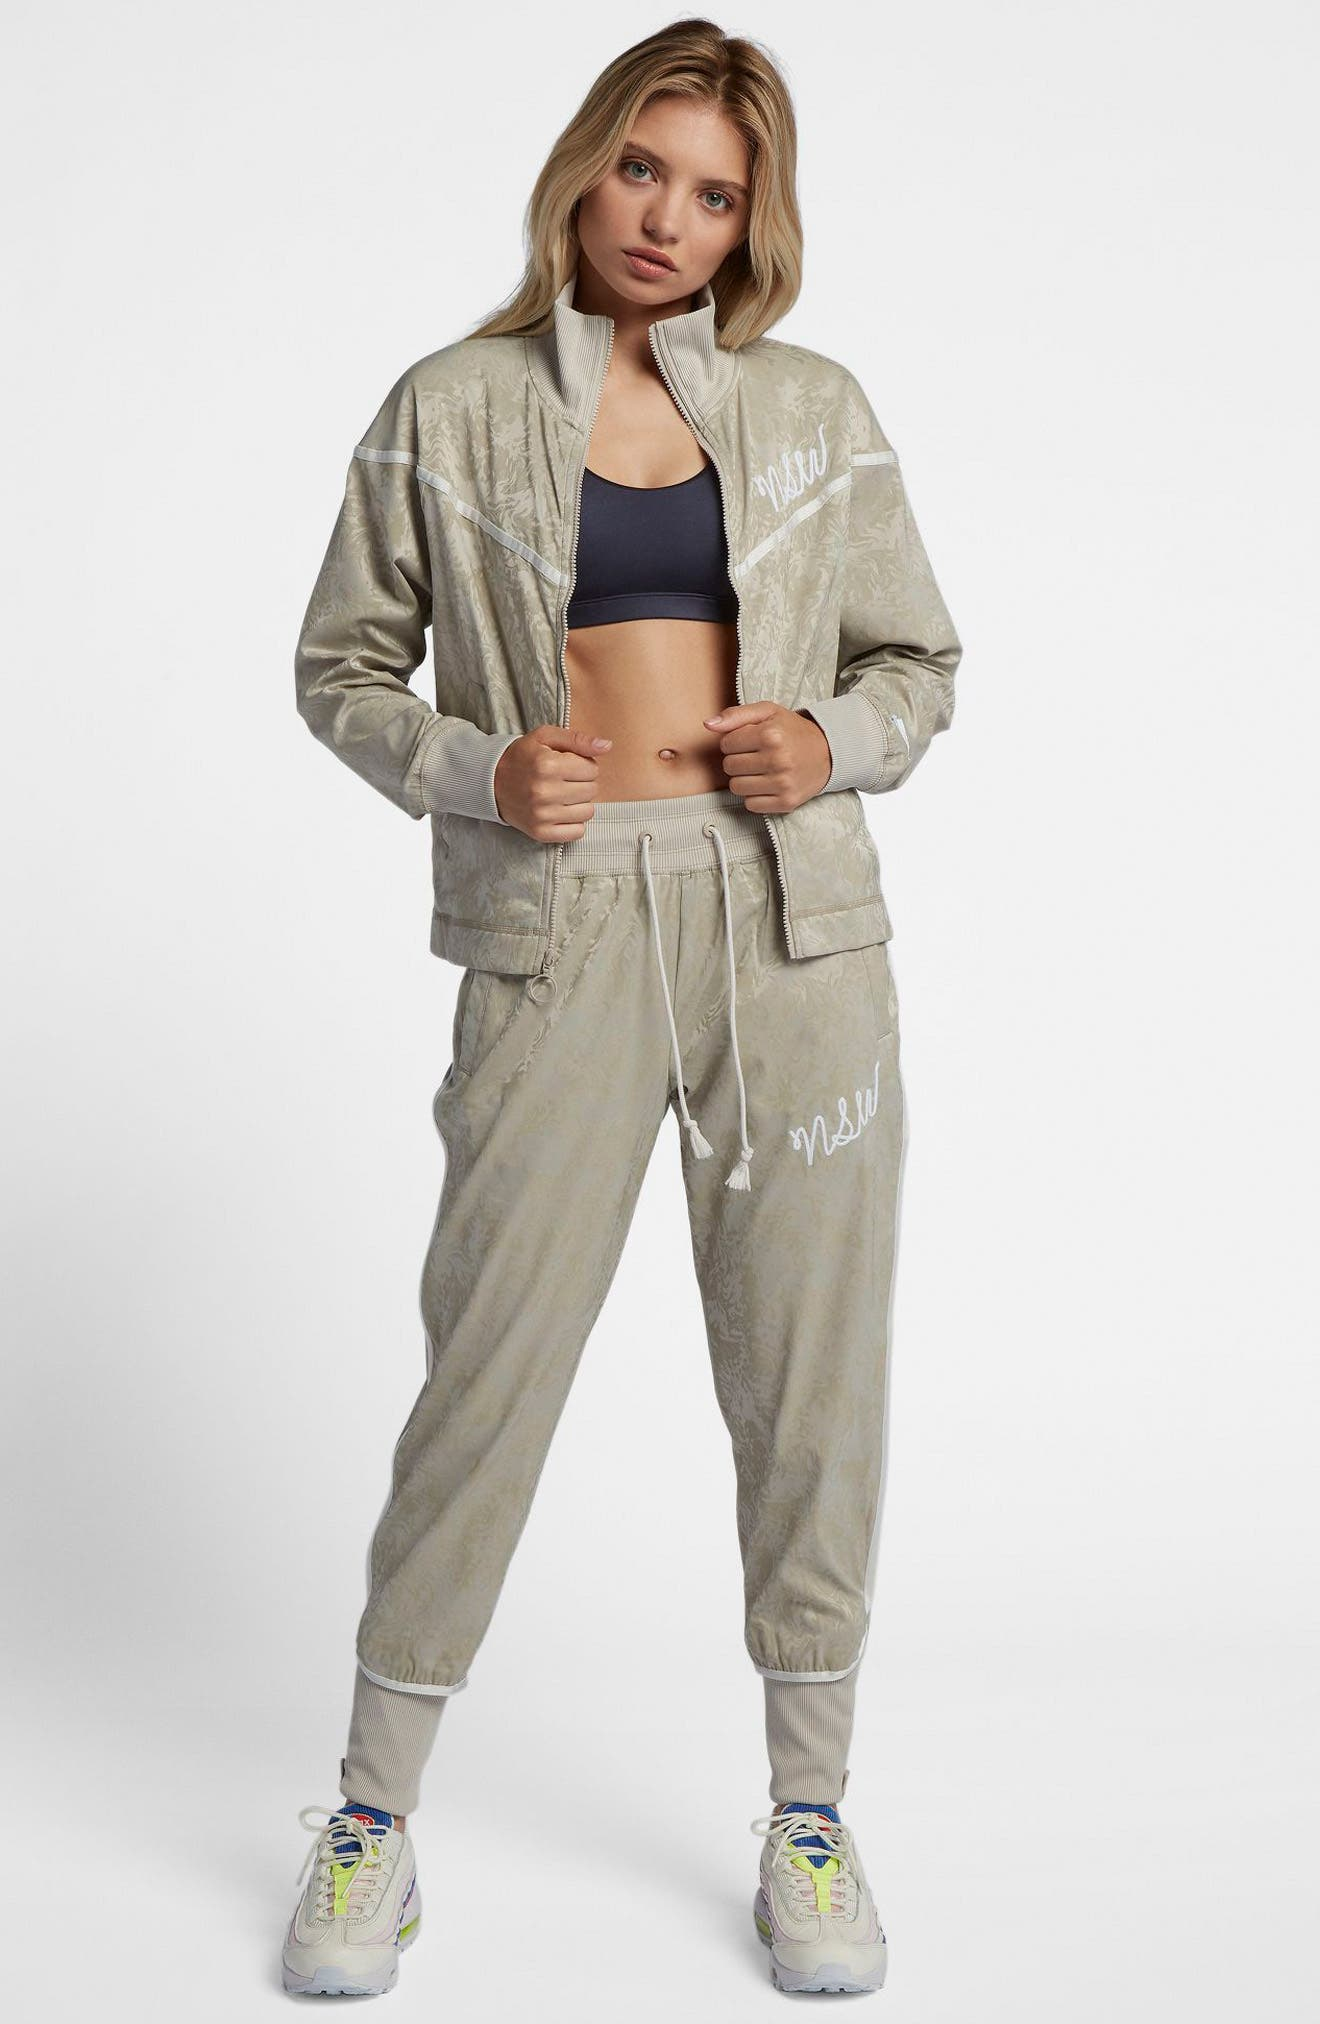 Sportswear NSW Women's Track Pants,                             Alternate thumbnail 9, color,                             201